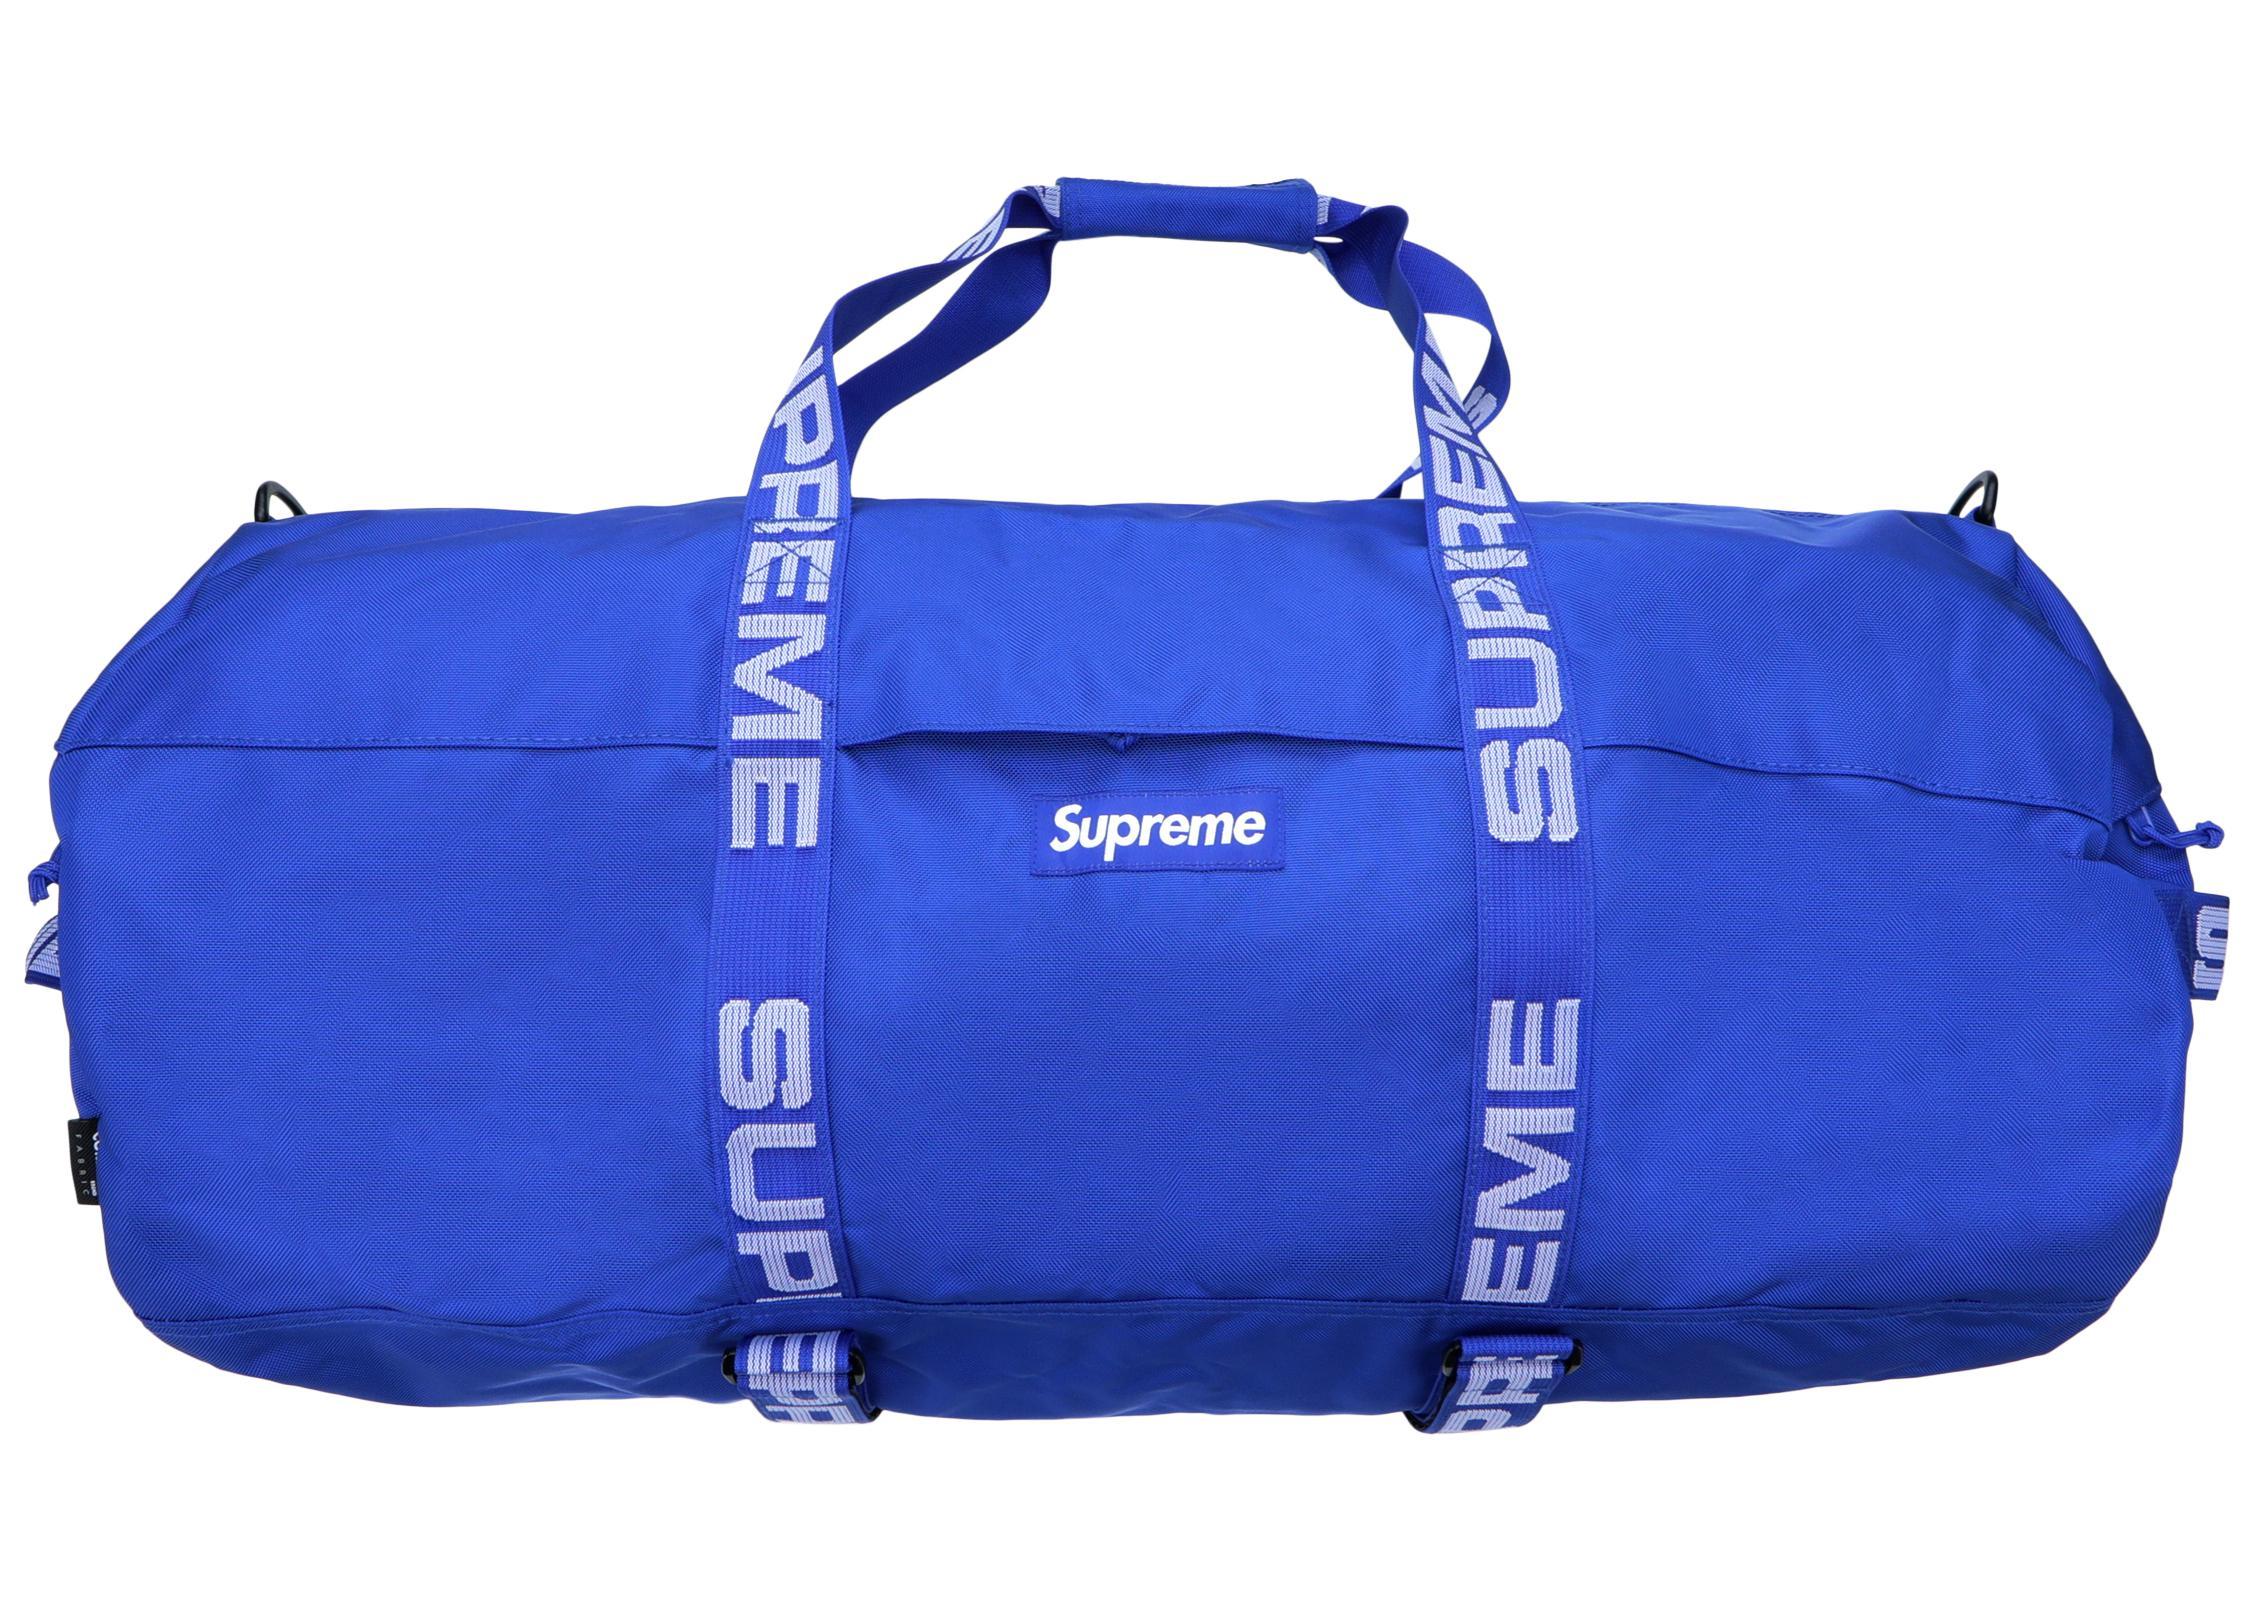 8c09ce5fca06 Supreme - Blue Duffle Bag (ss18) Royal for Men - Lyst. View fullscreen